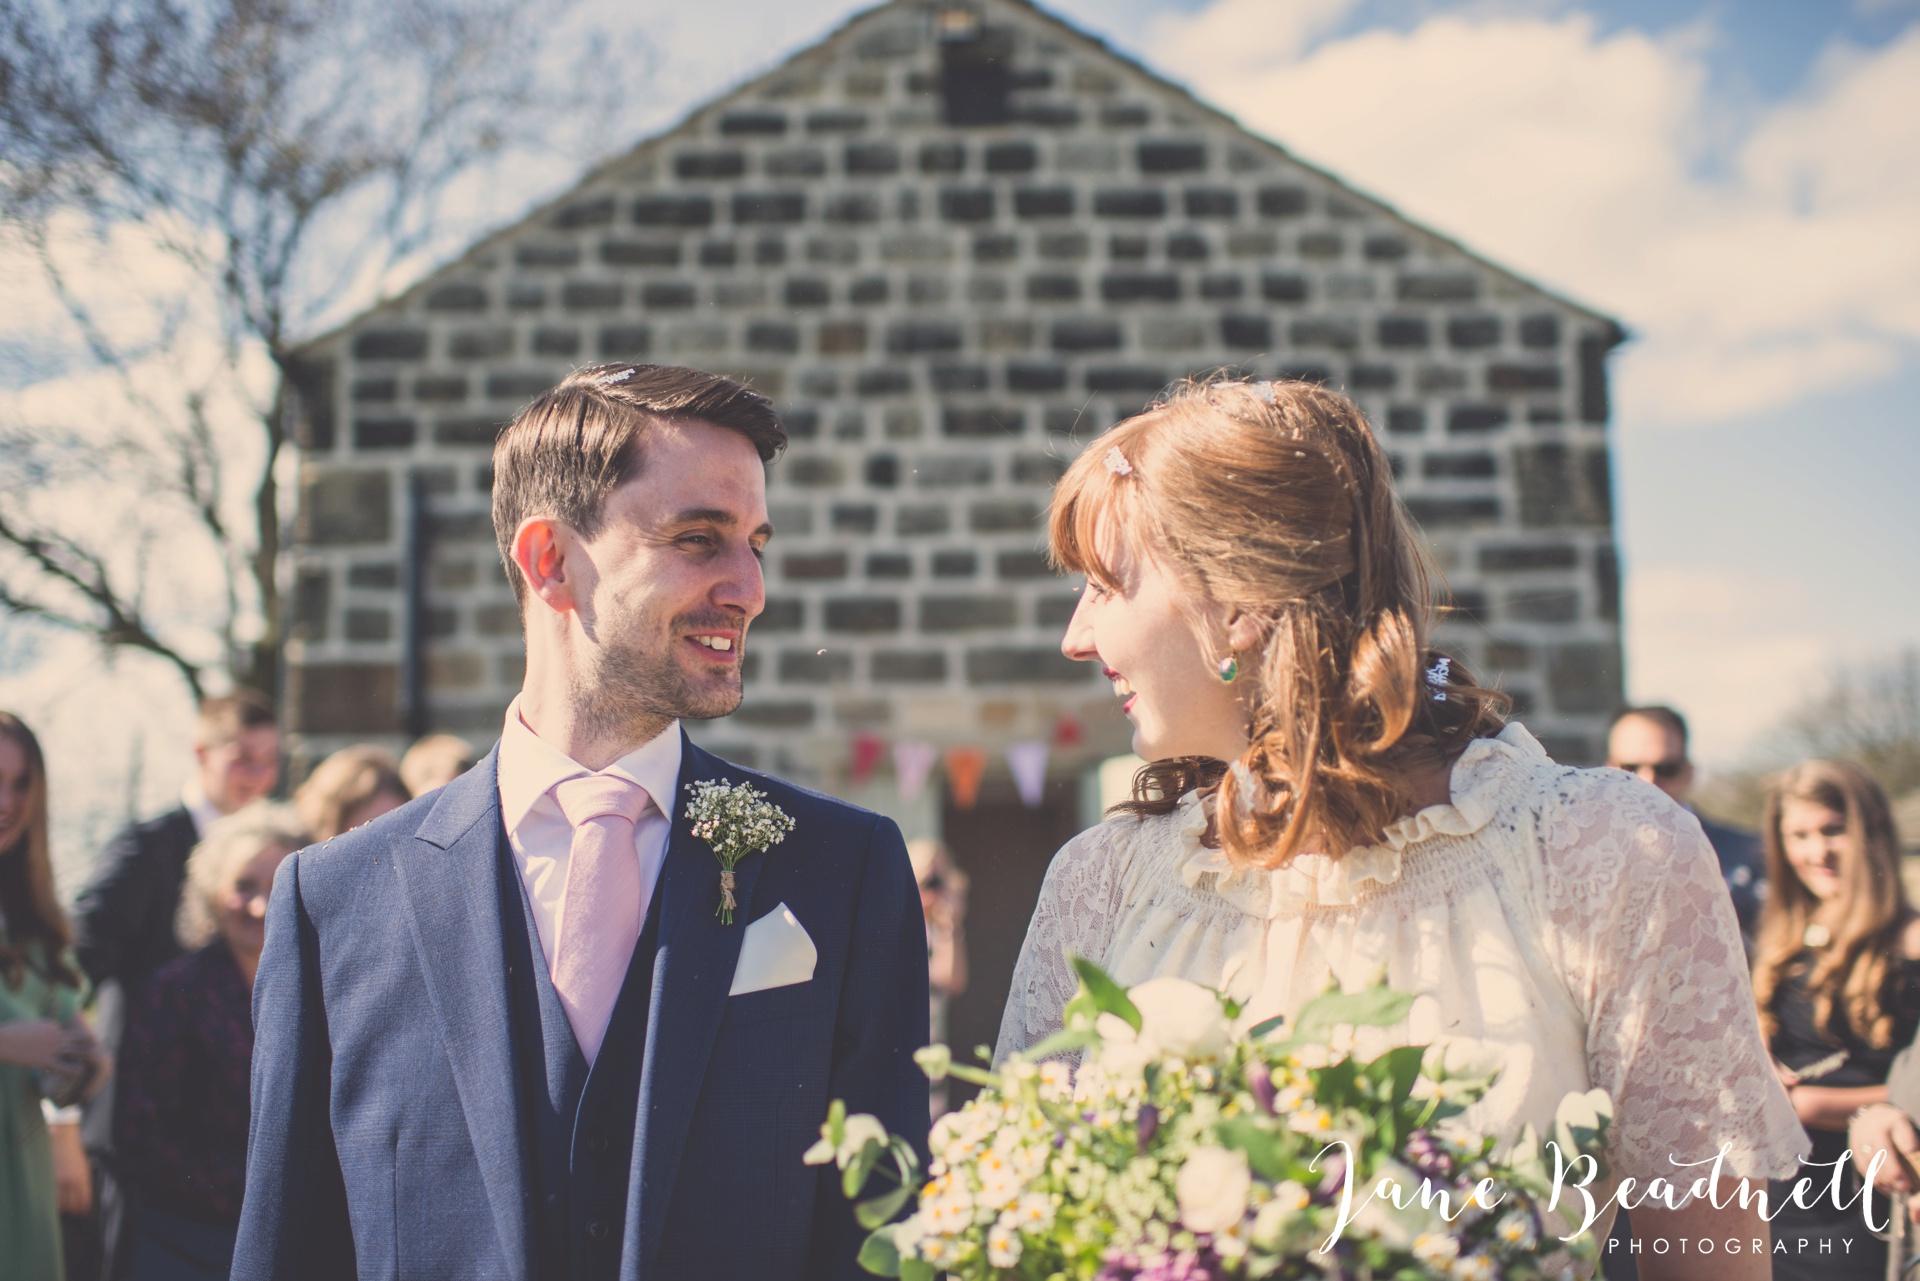 Jane Beadnell fine art wedding photographer The Cheerful Chilli Barn Otley_0028